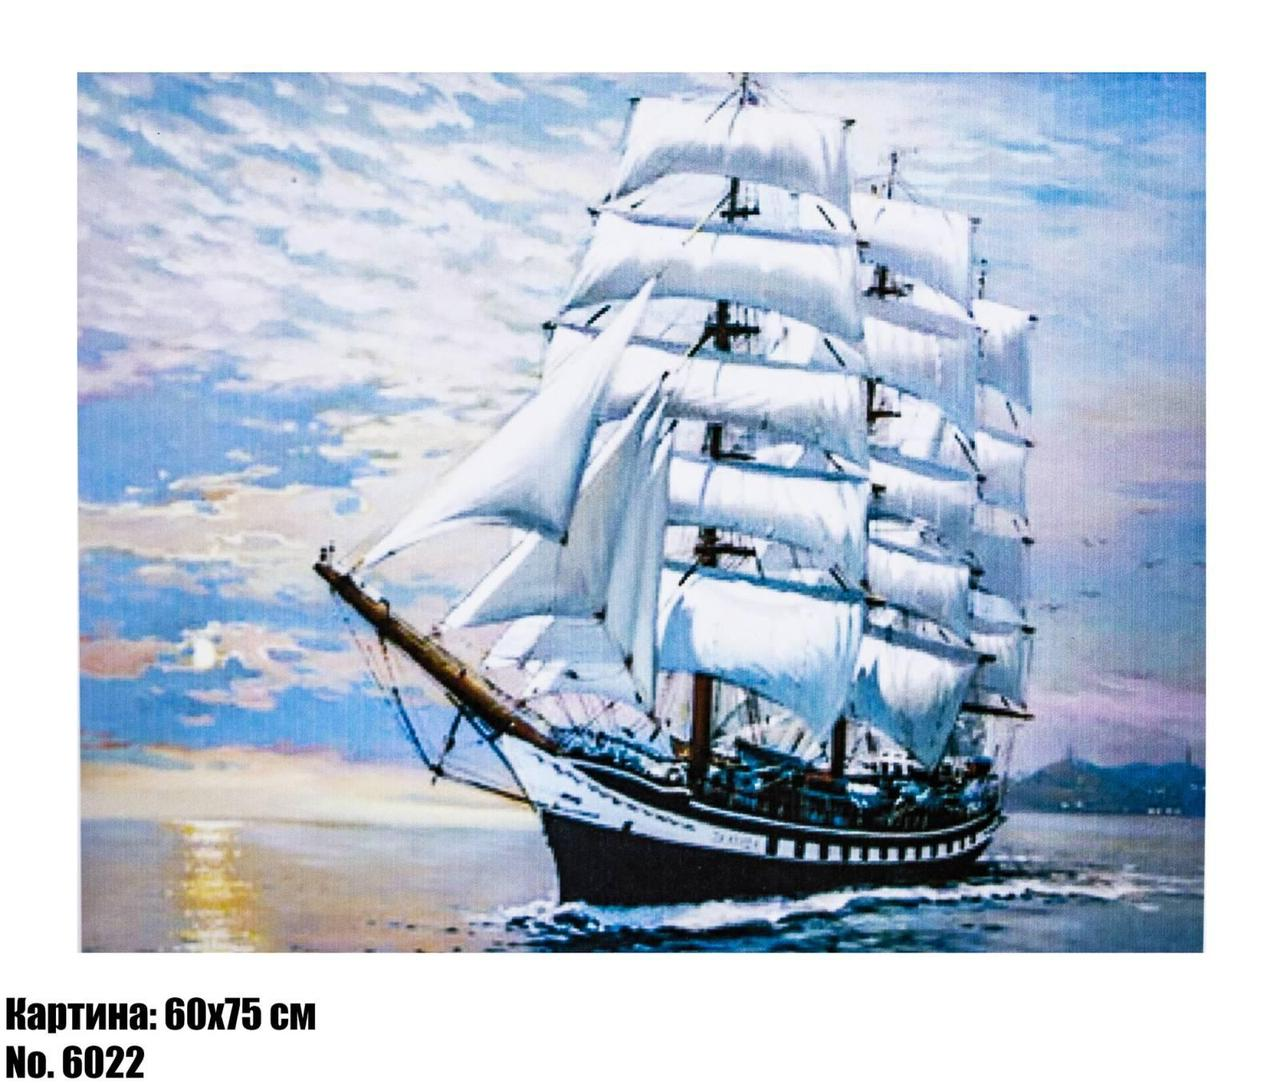 "Картина по номерам ""Фрегат с белыми парусами"", размер 60 х 75 см, код 6022"